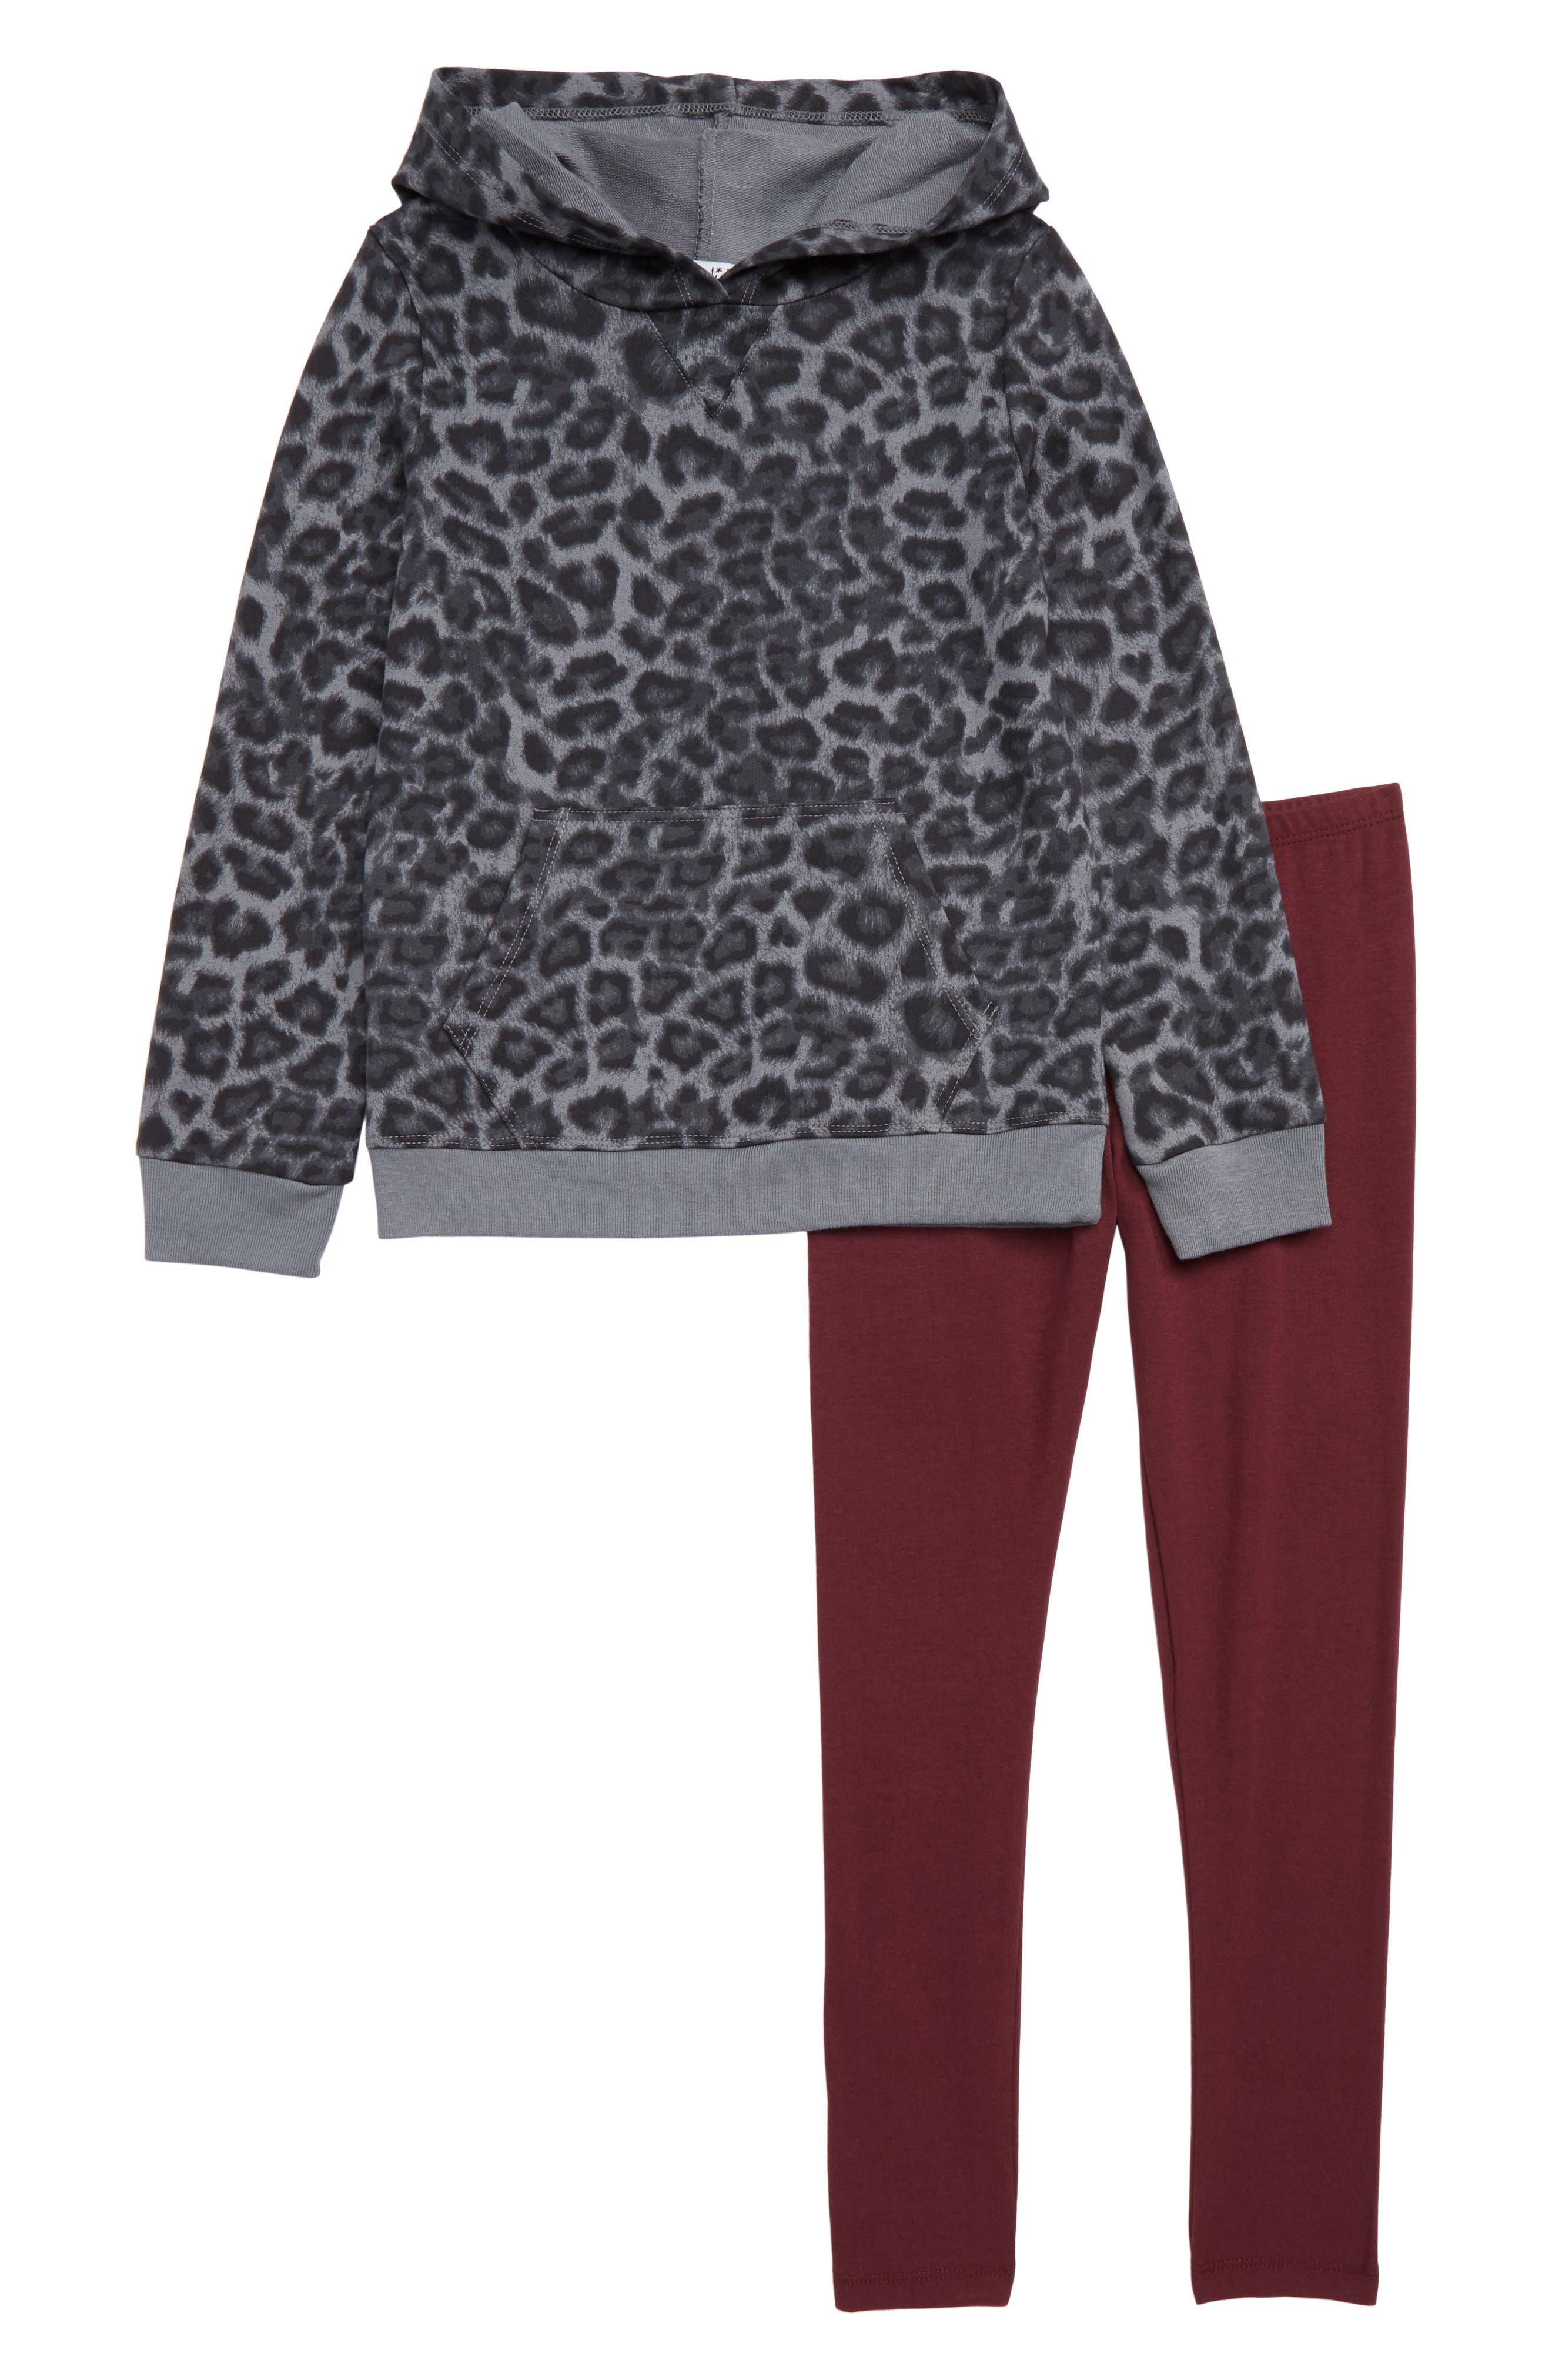 Girls Splendid Leopard Print Hoodie  Legging Set